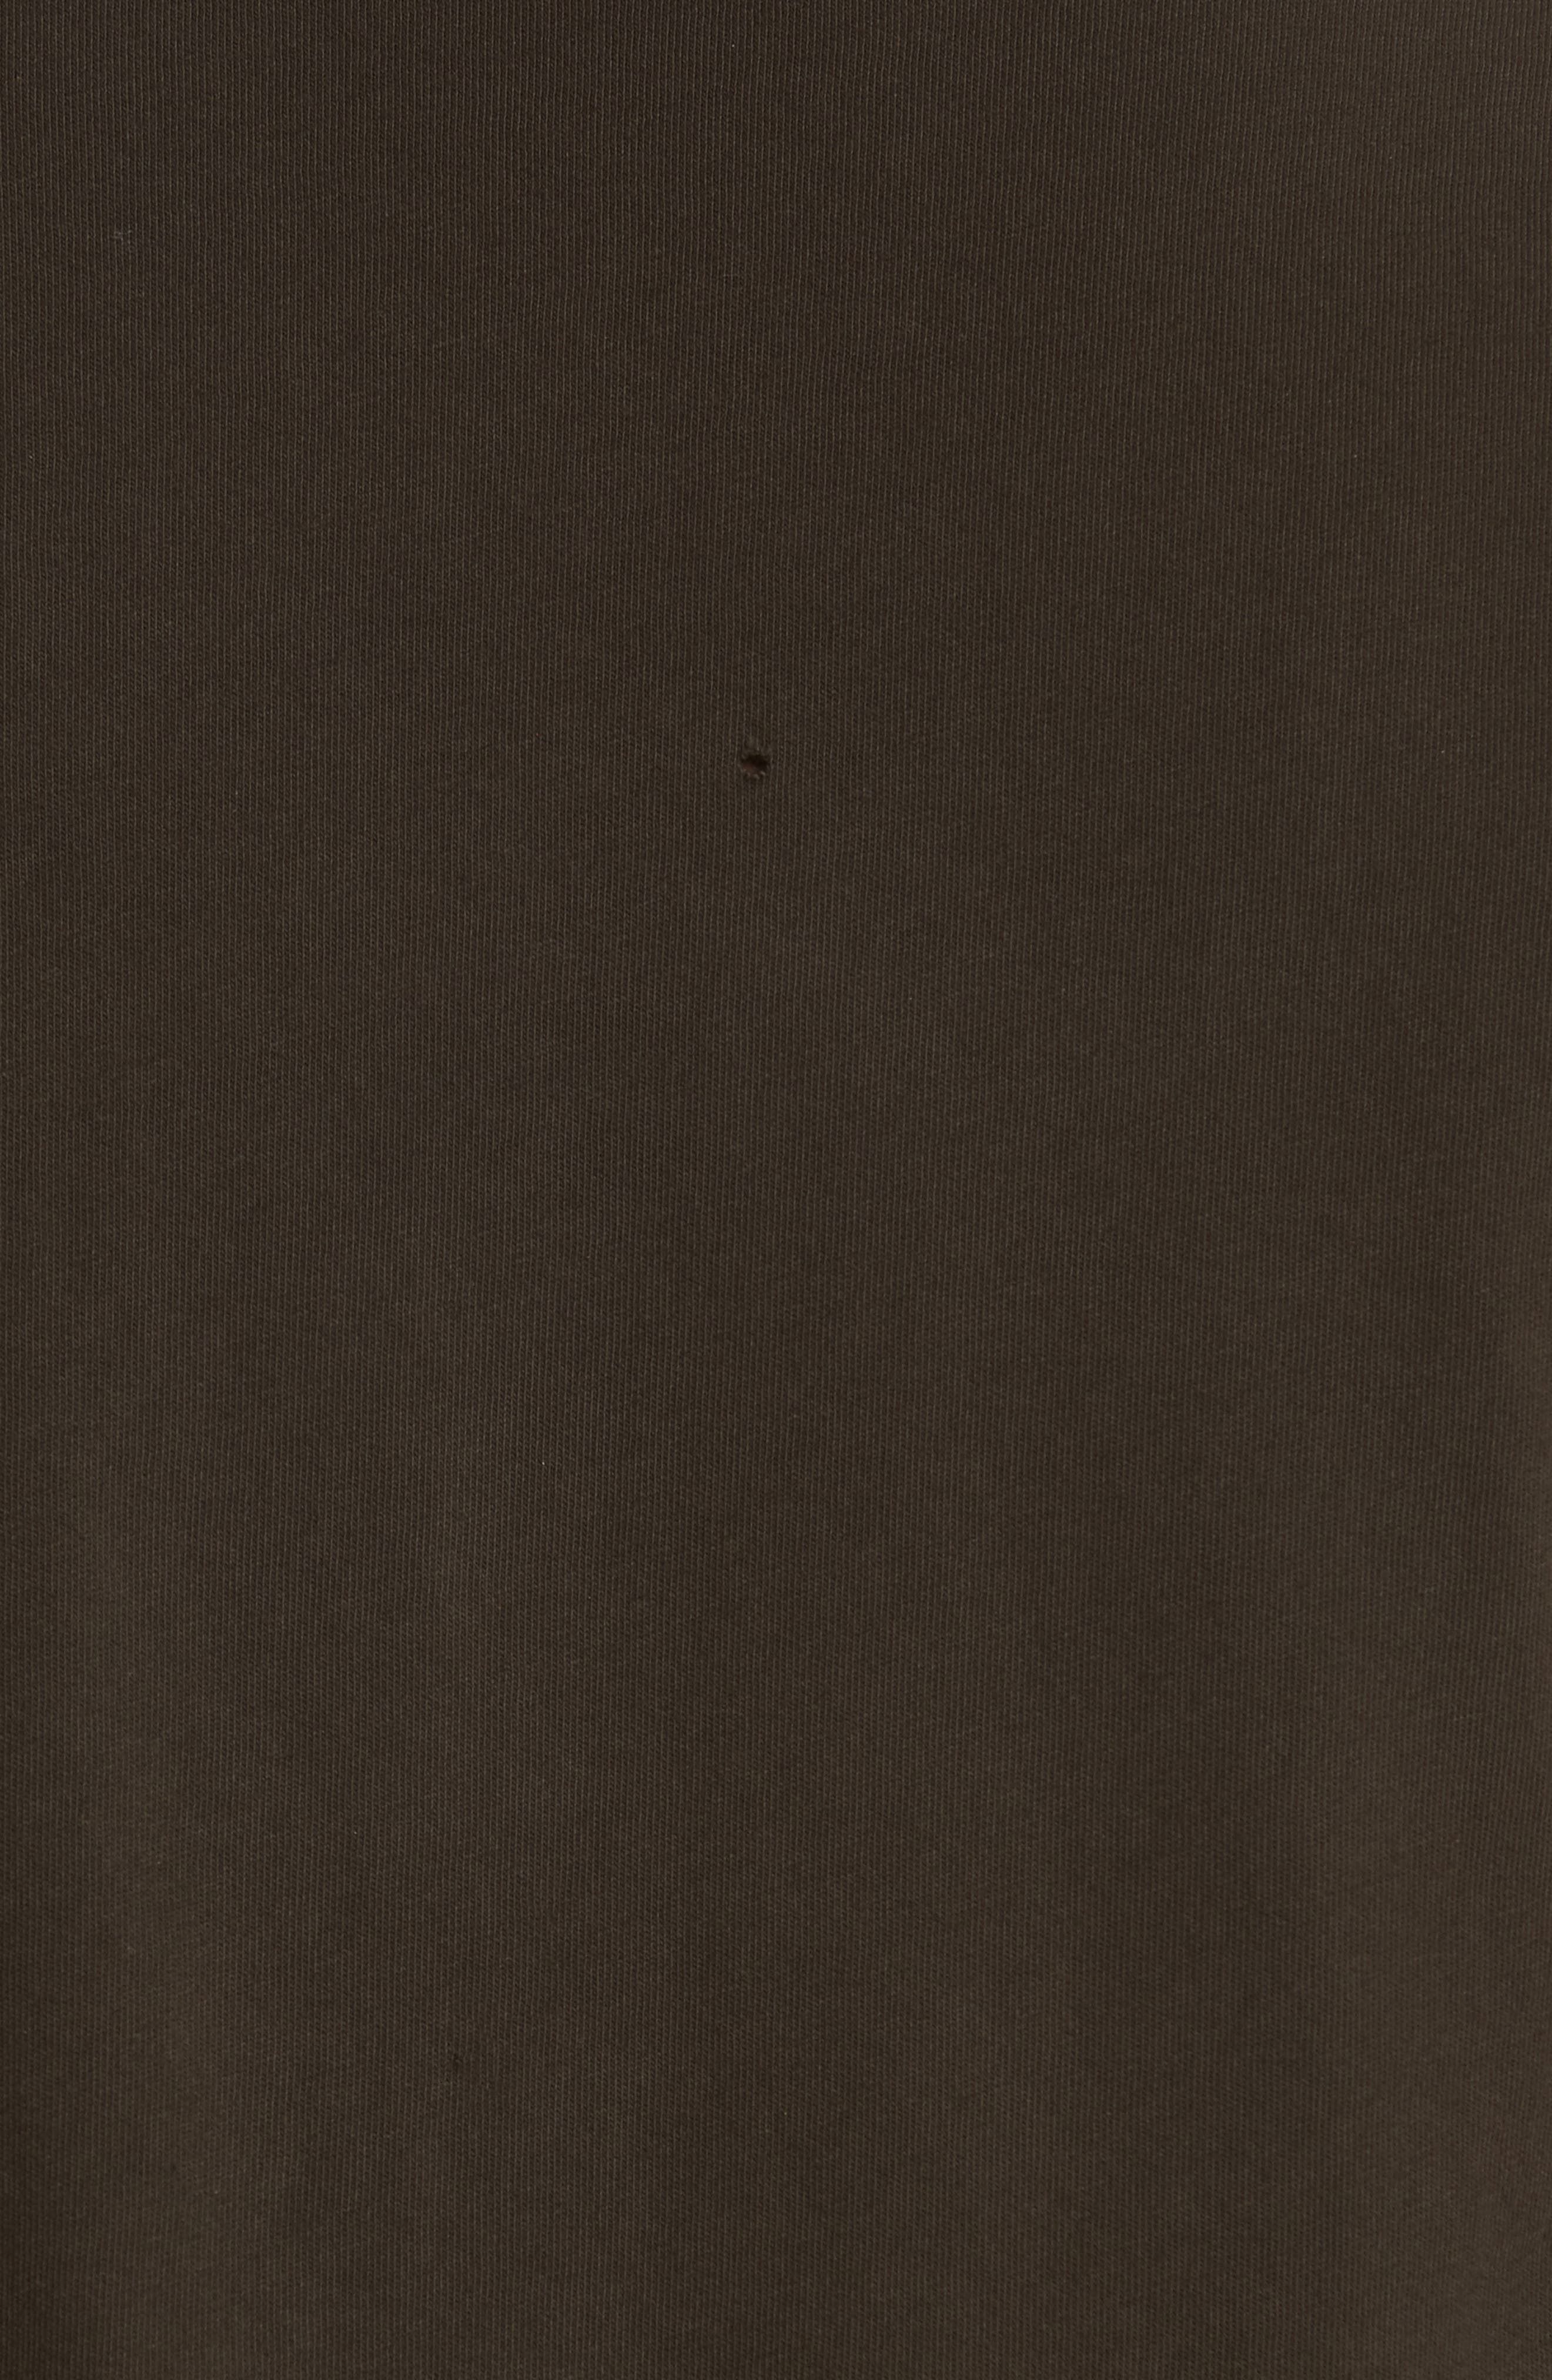 Ramones Graphic T-Shirt,                             Alternate thumbnail 5, color,